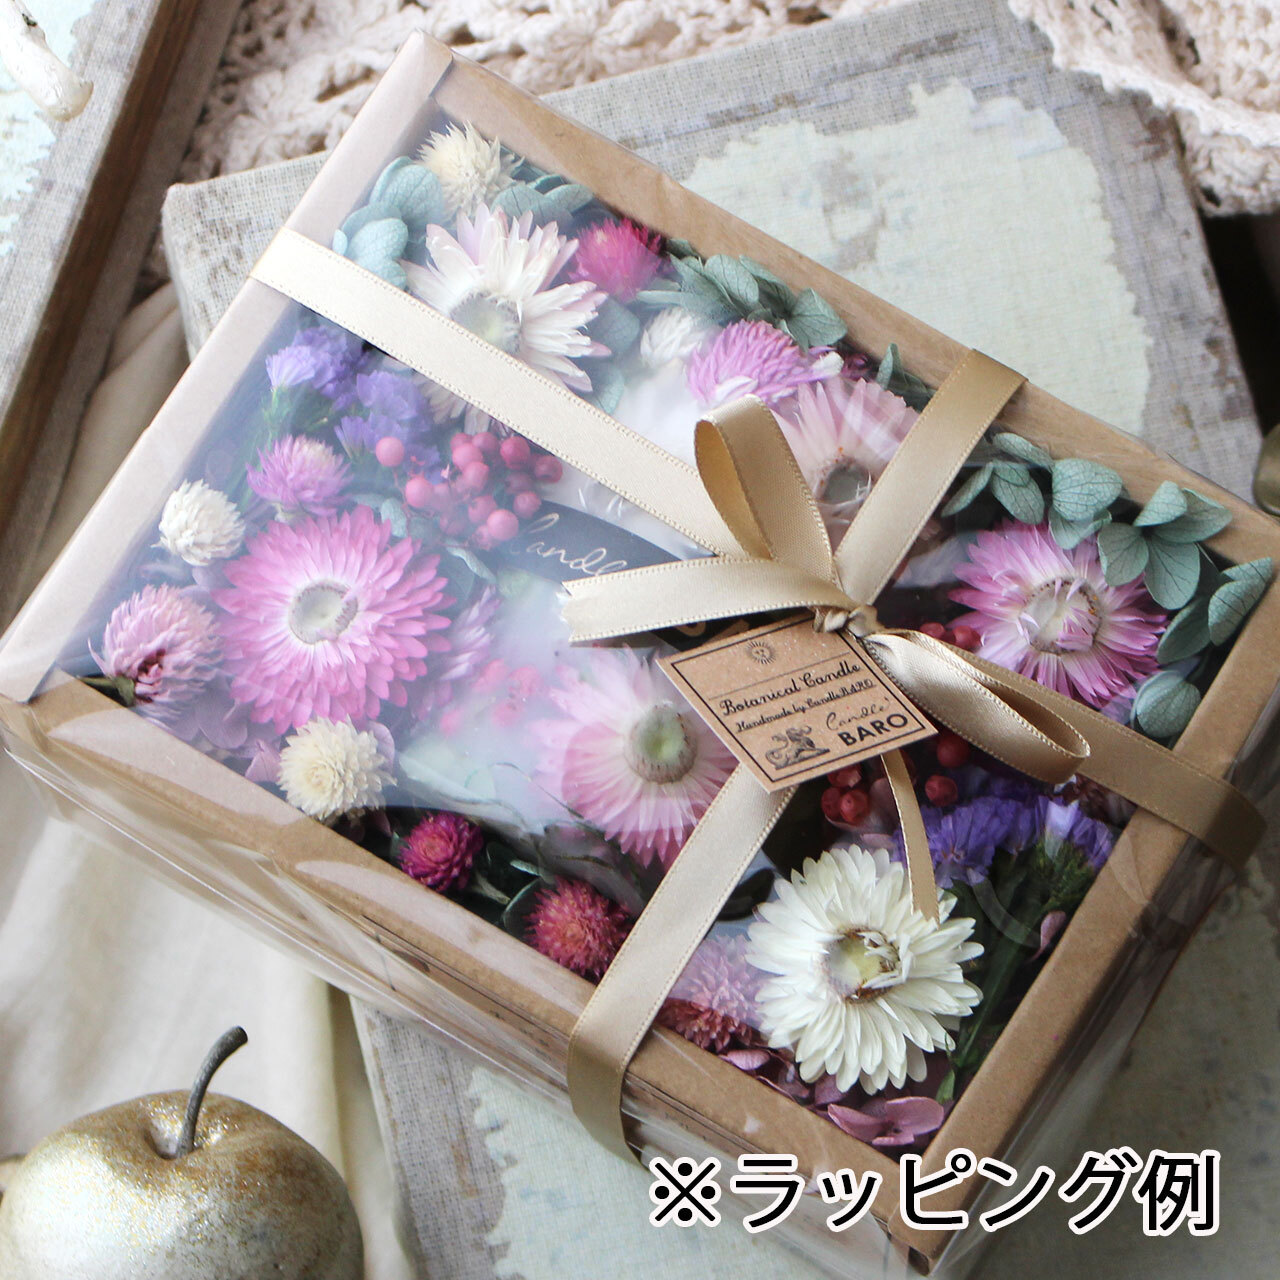 H483 透明ラッピング&紙袋付き☆ボタニカルキャンドルギフト ラナンキュラス